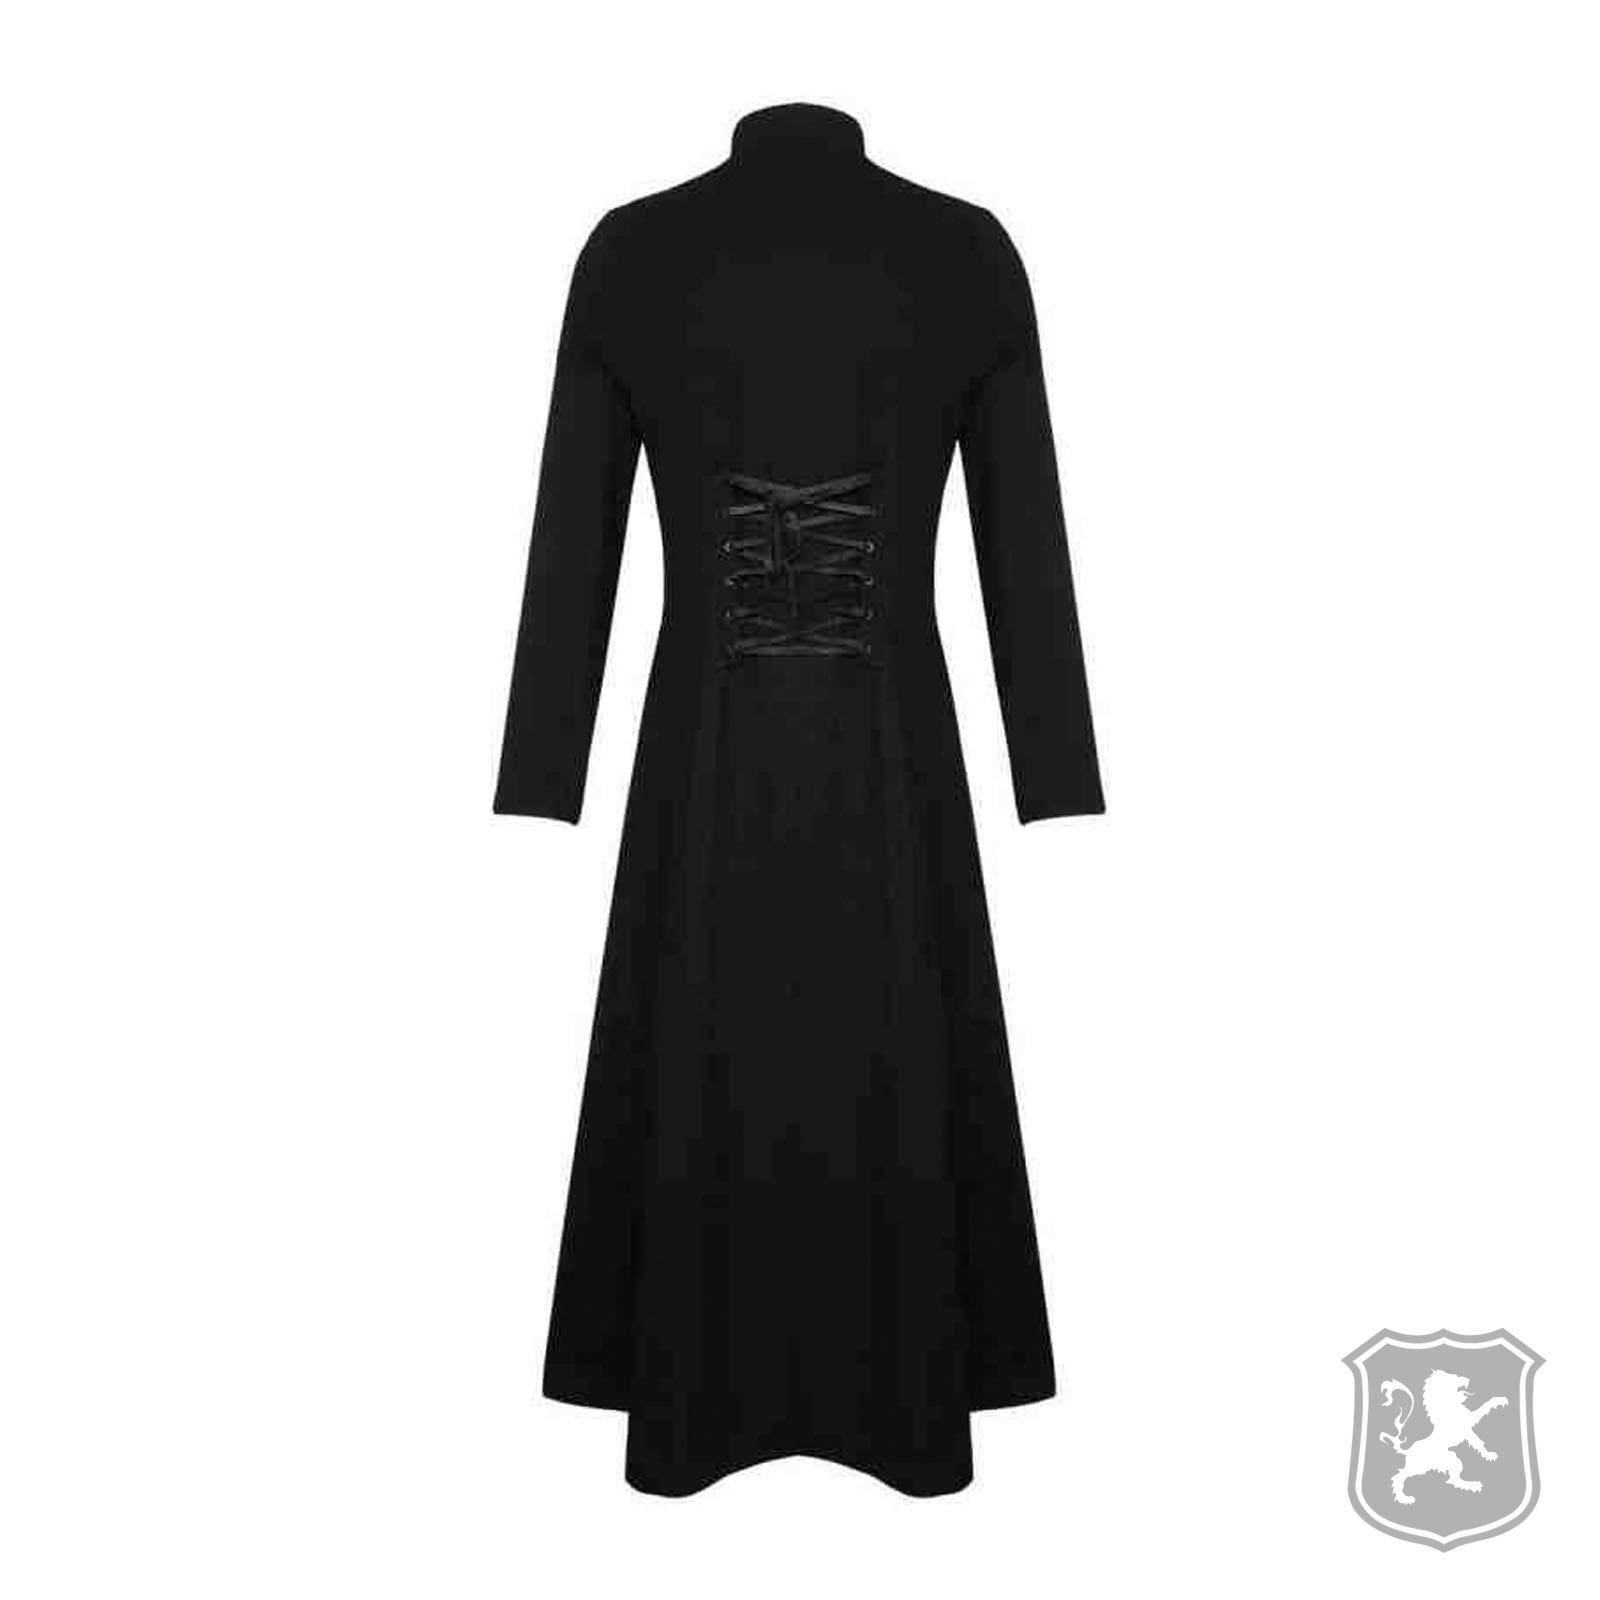 f36587ec2 Black Steampunk Military Trench Coat Long Jacket